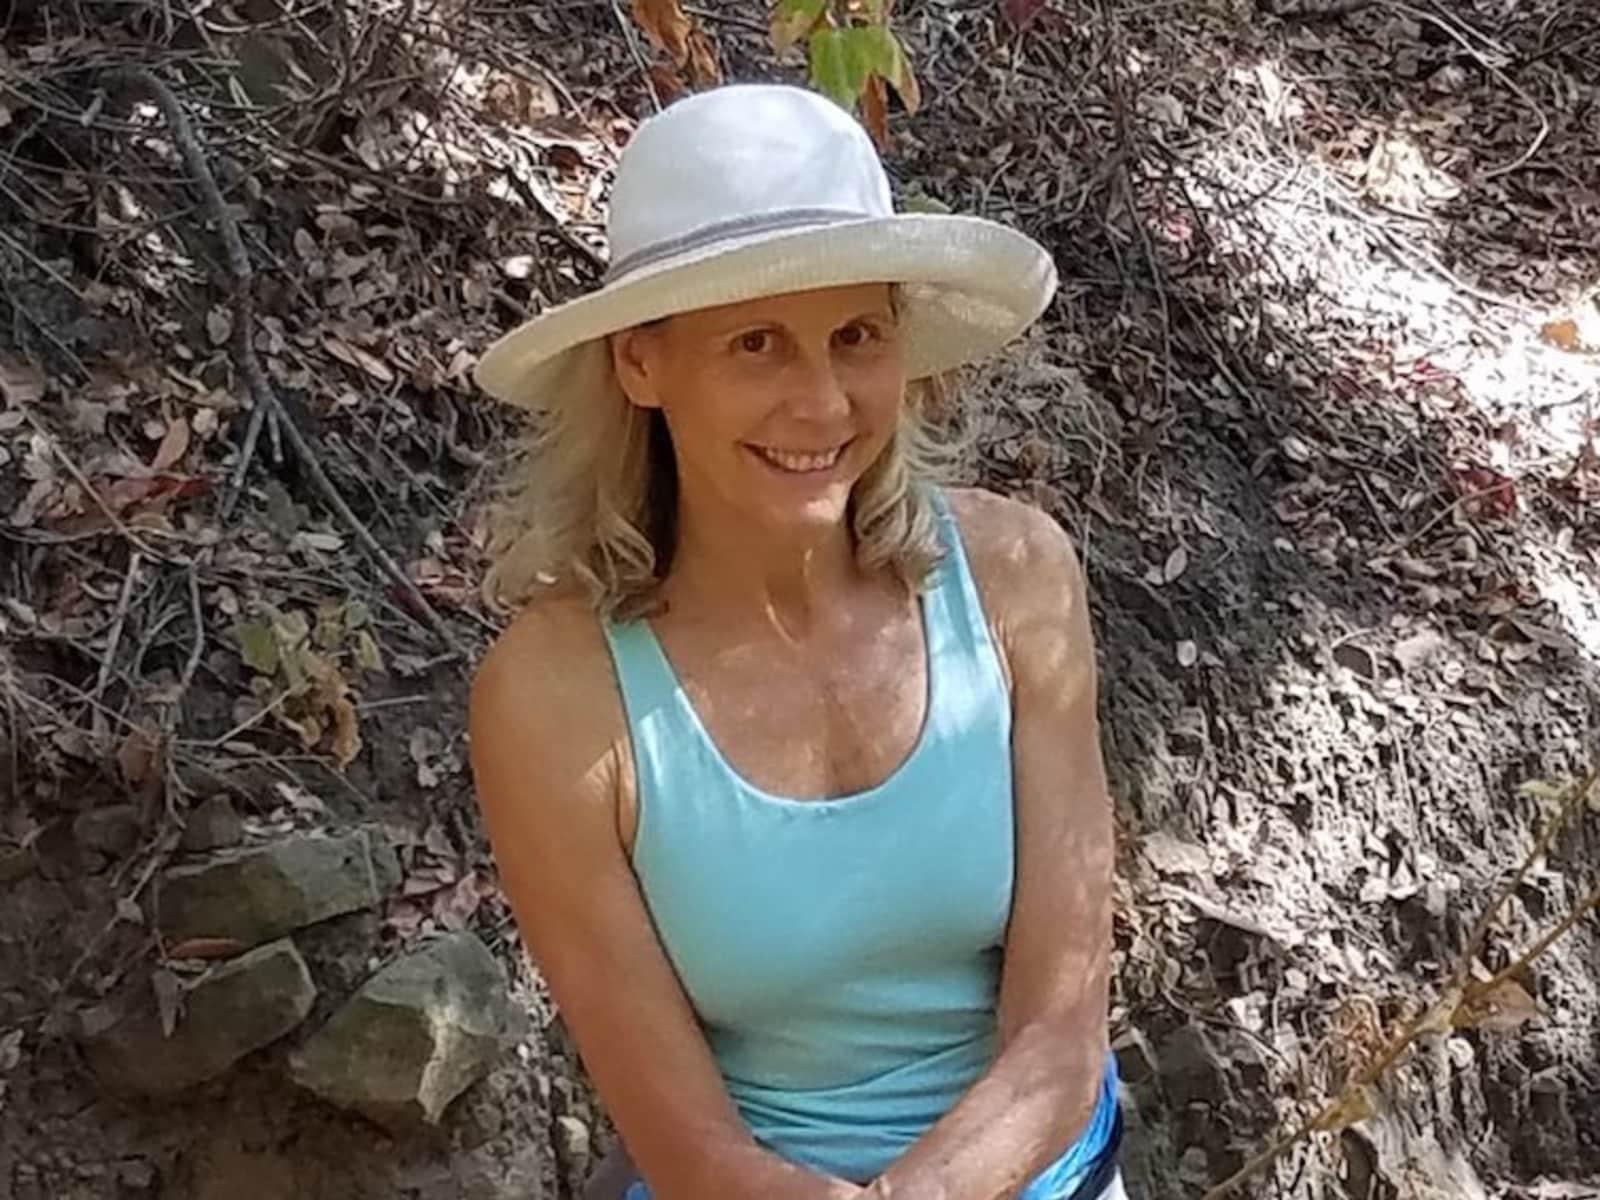 Anna laura from Santa Barbara, California, United States